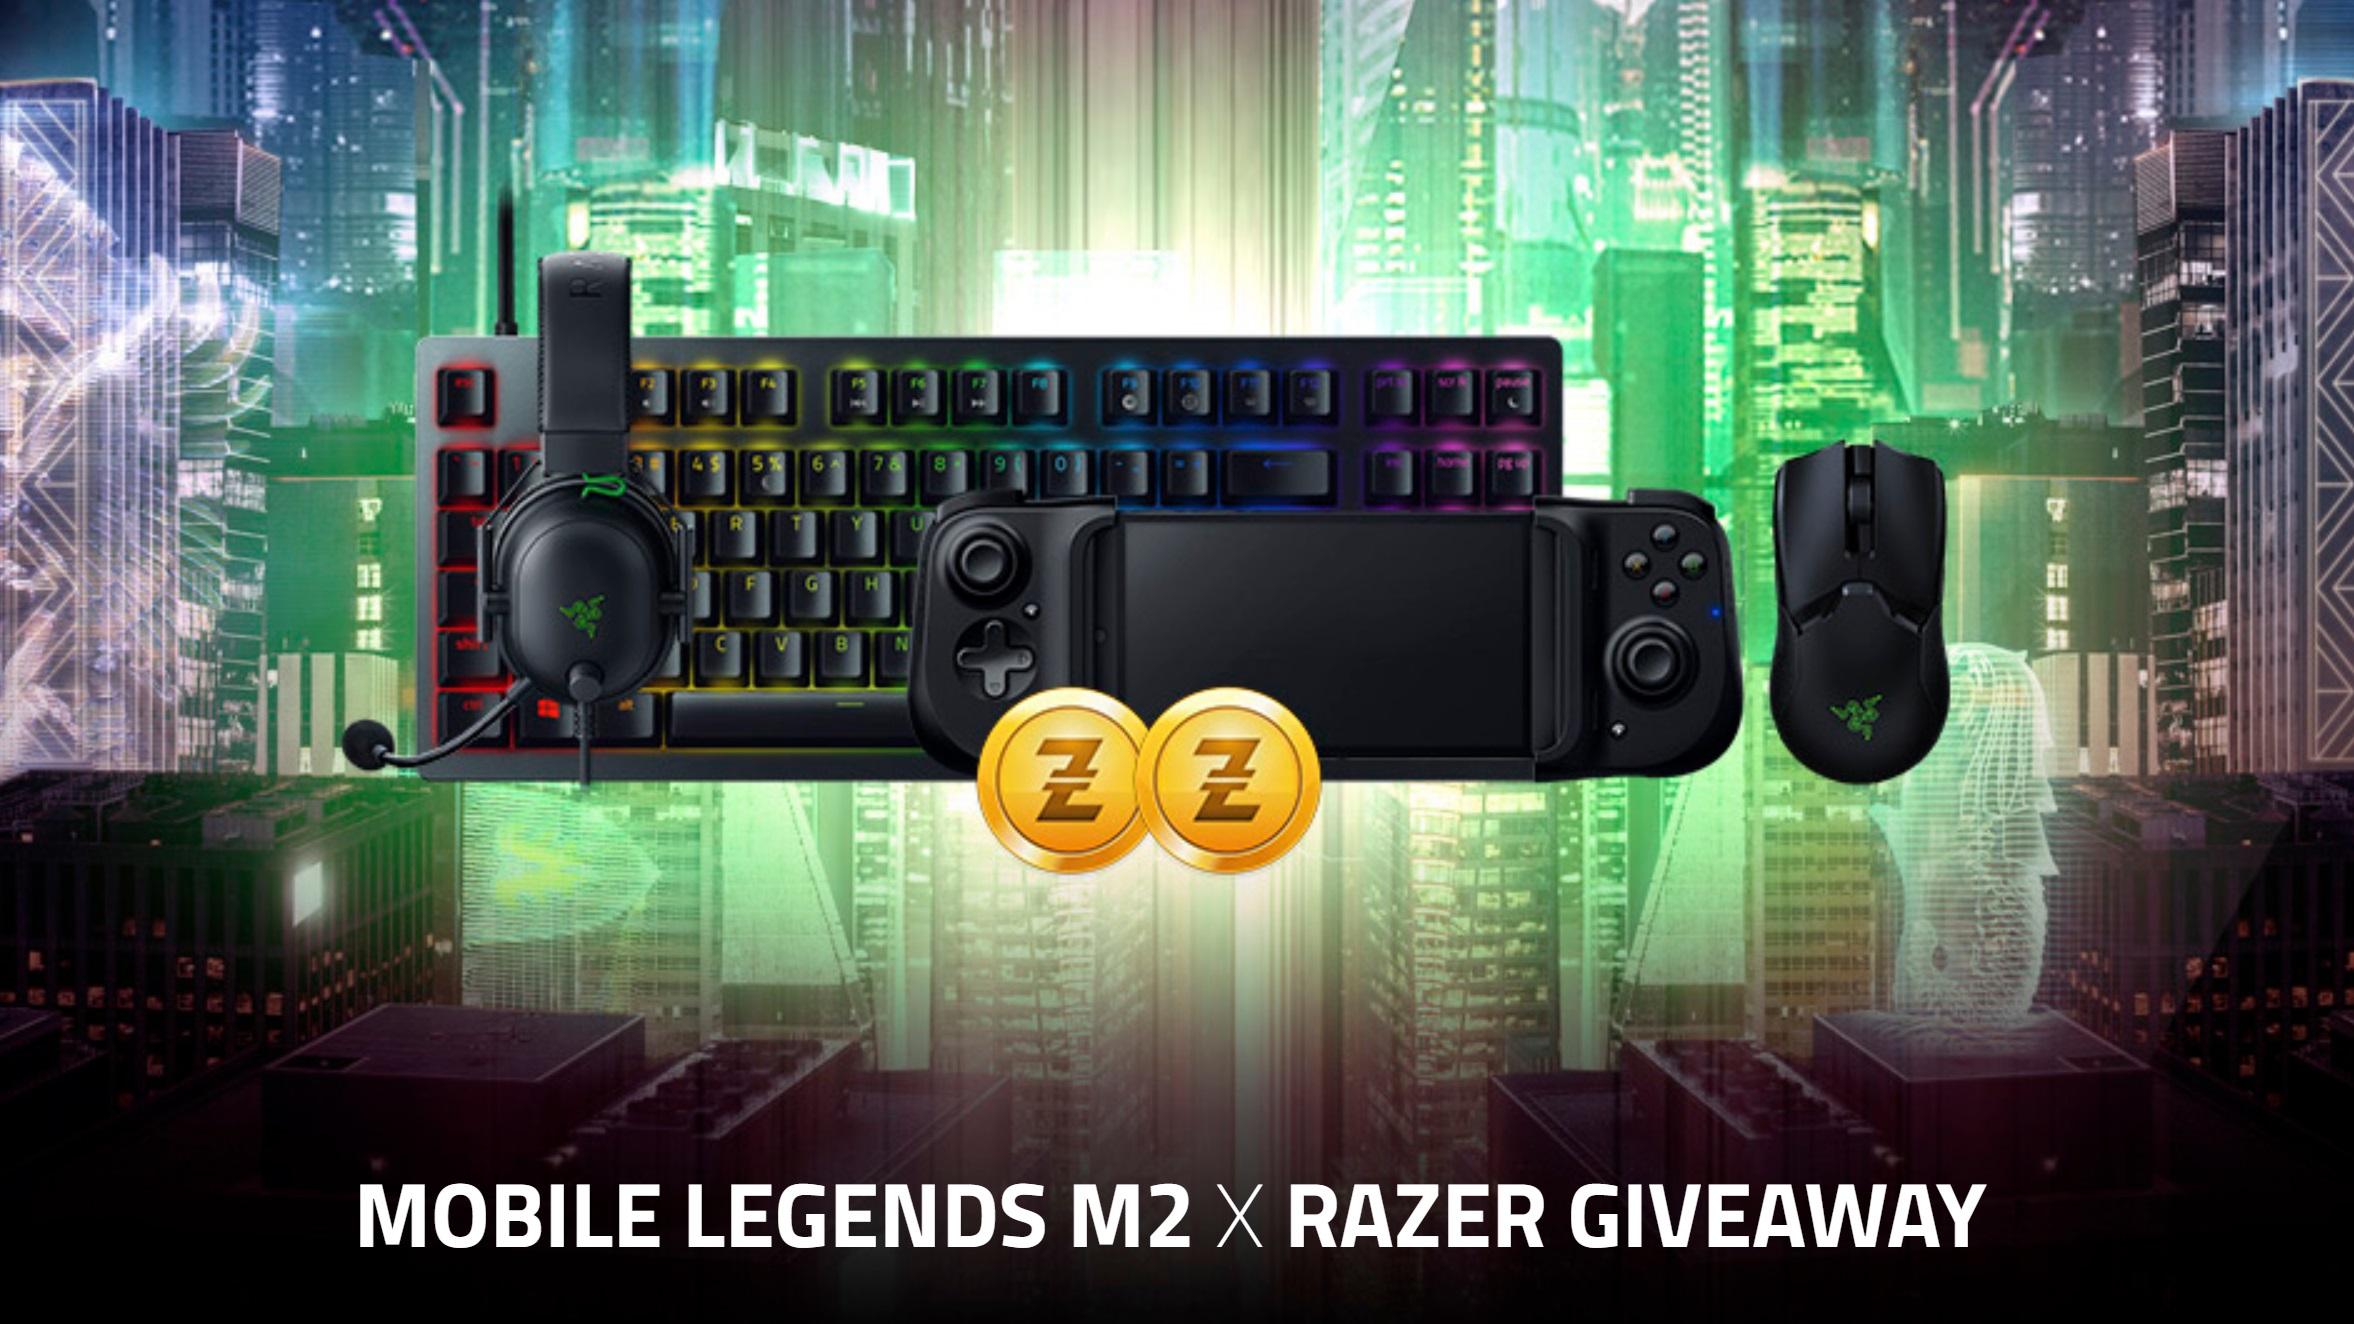 Razer kini Rakan Peralatan Gaming Moonton untuk kejohanan M2